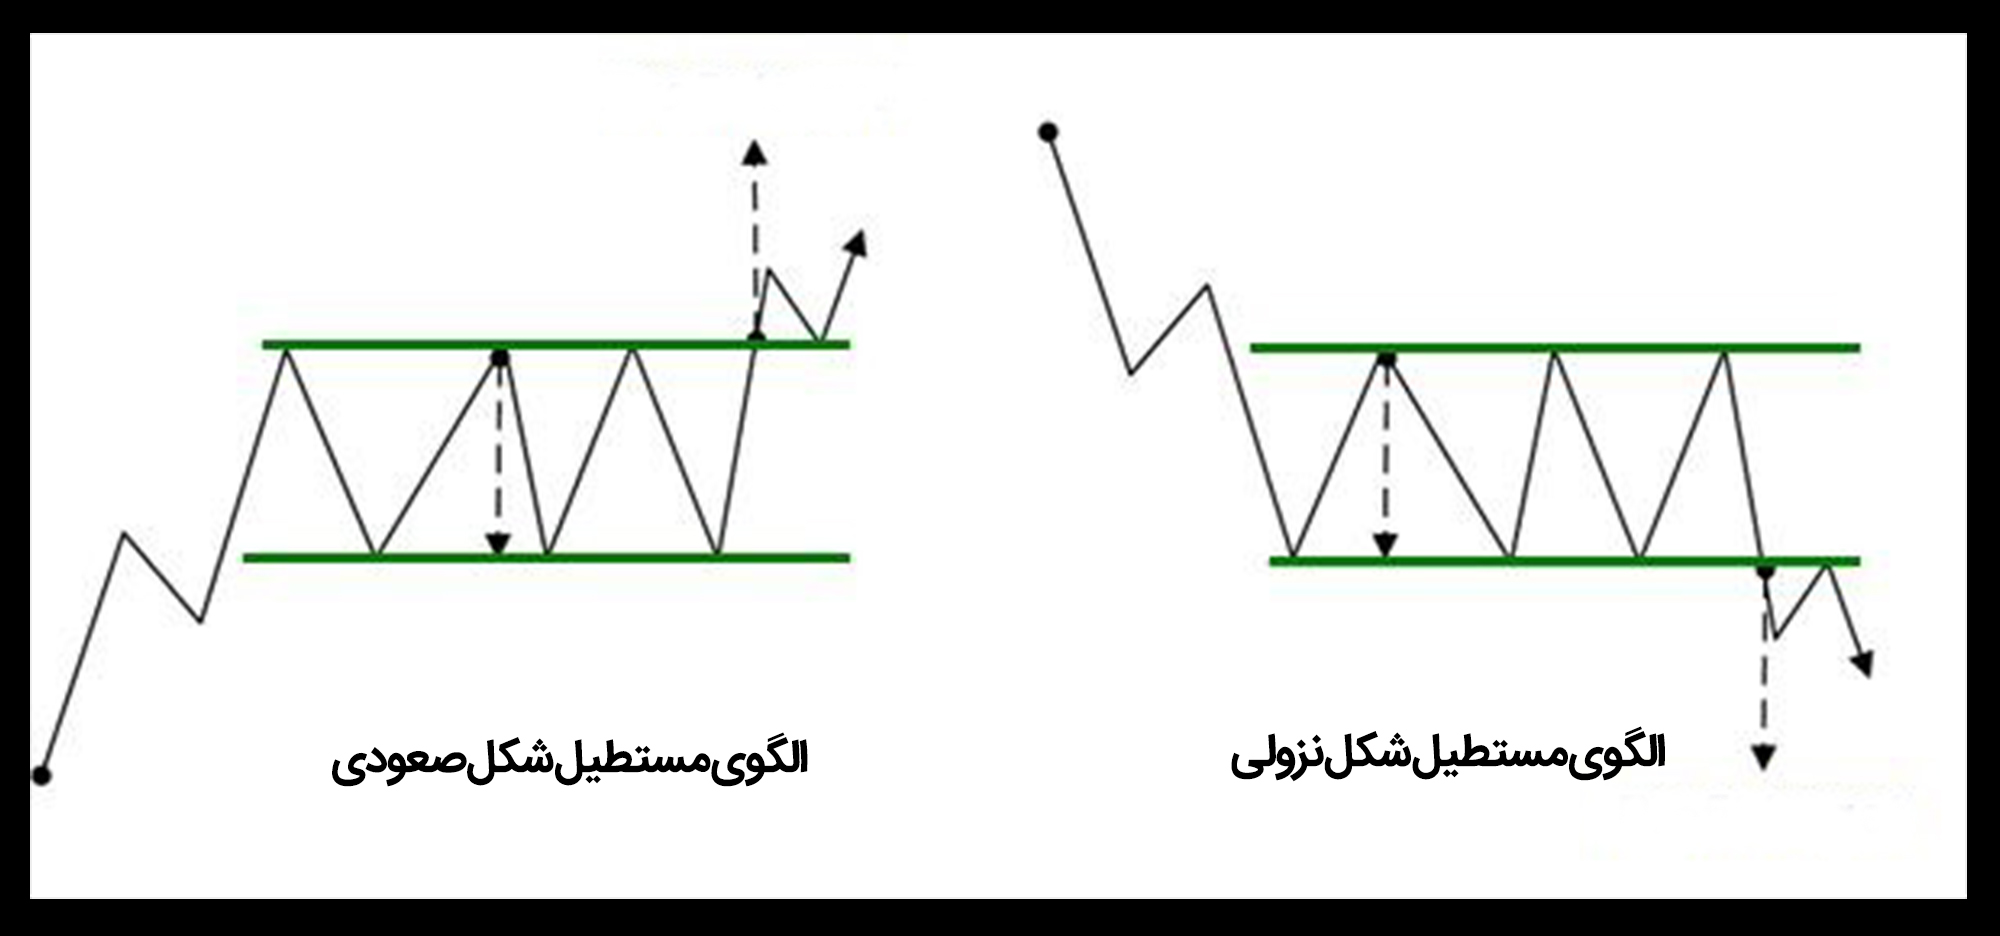 الگوی مستطیل تحلیل تکنیکال